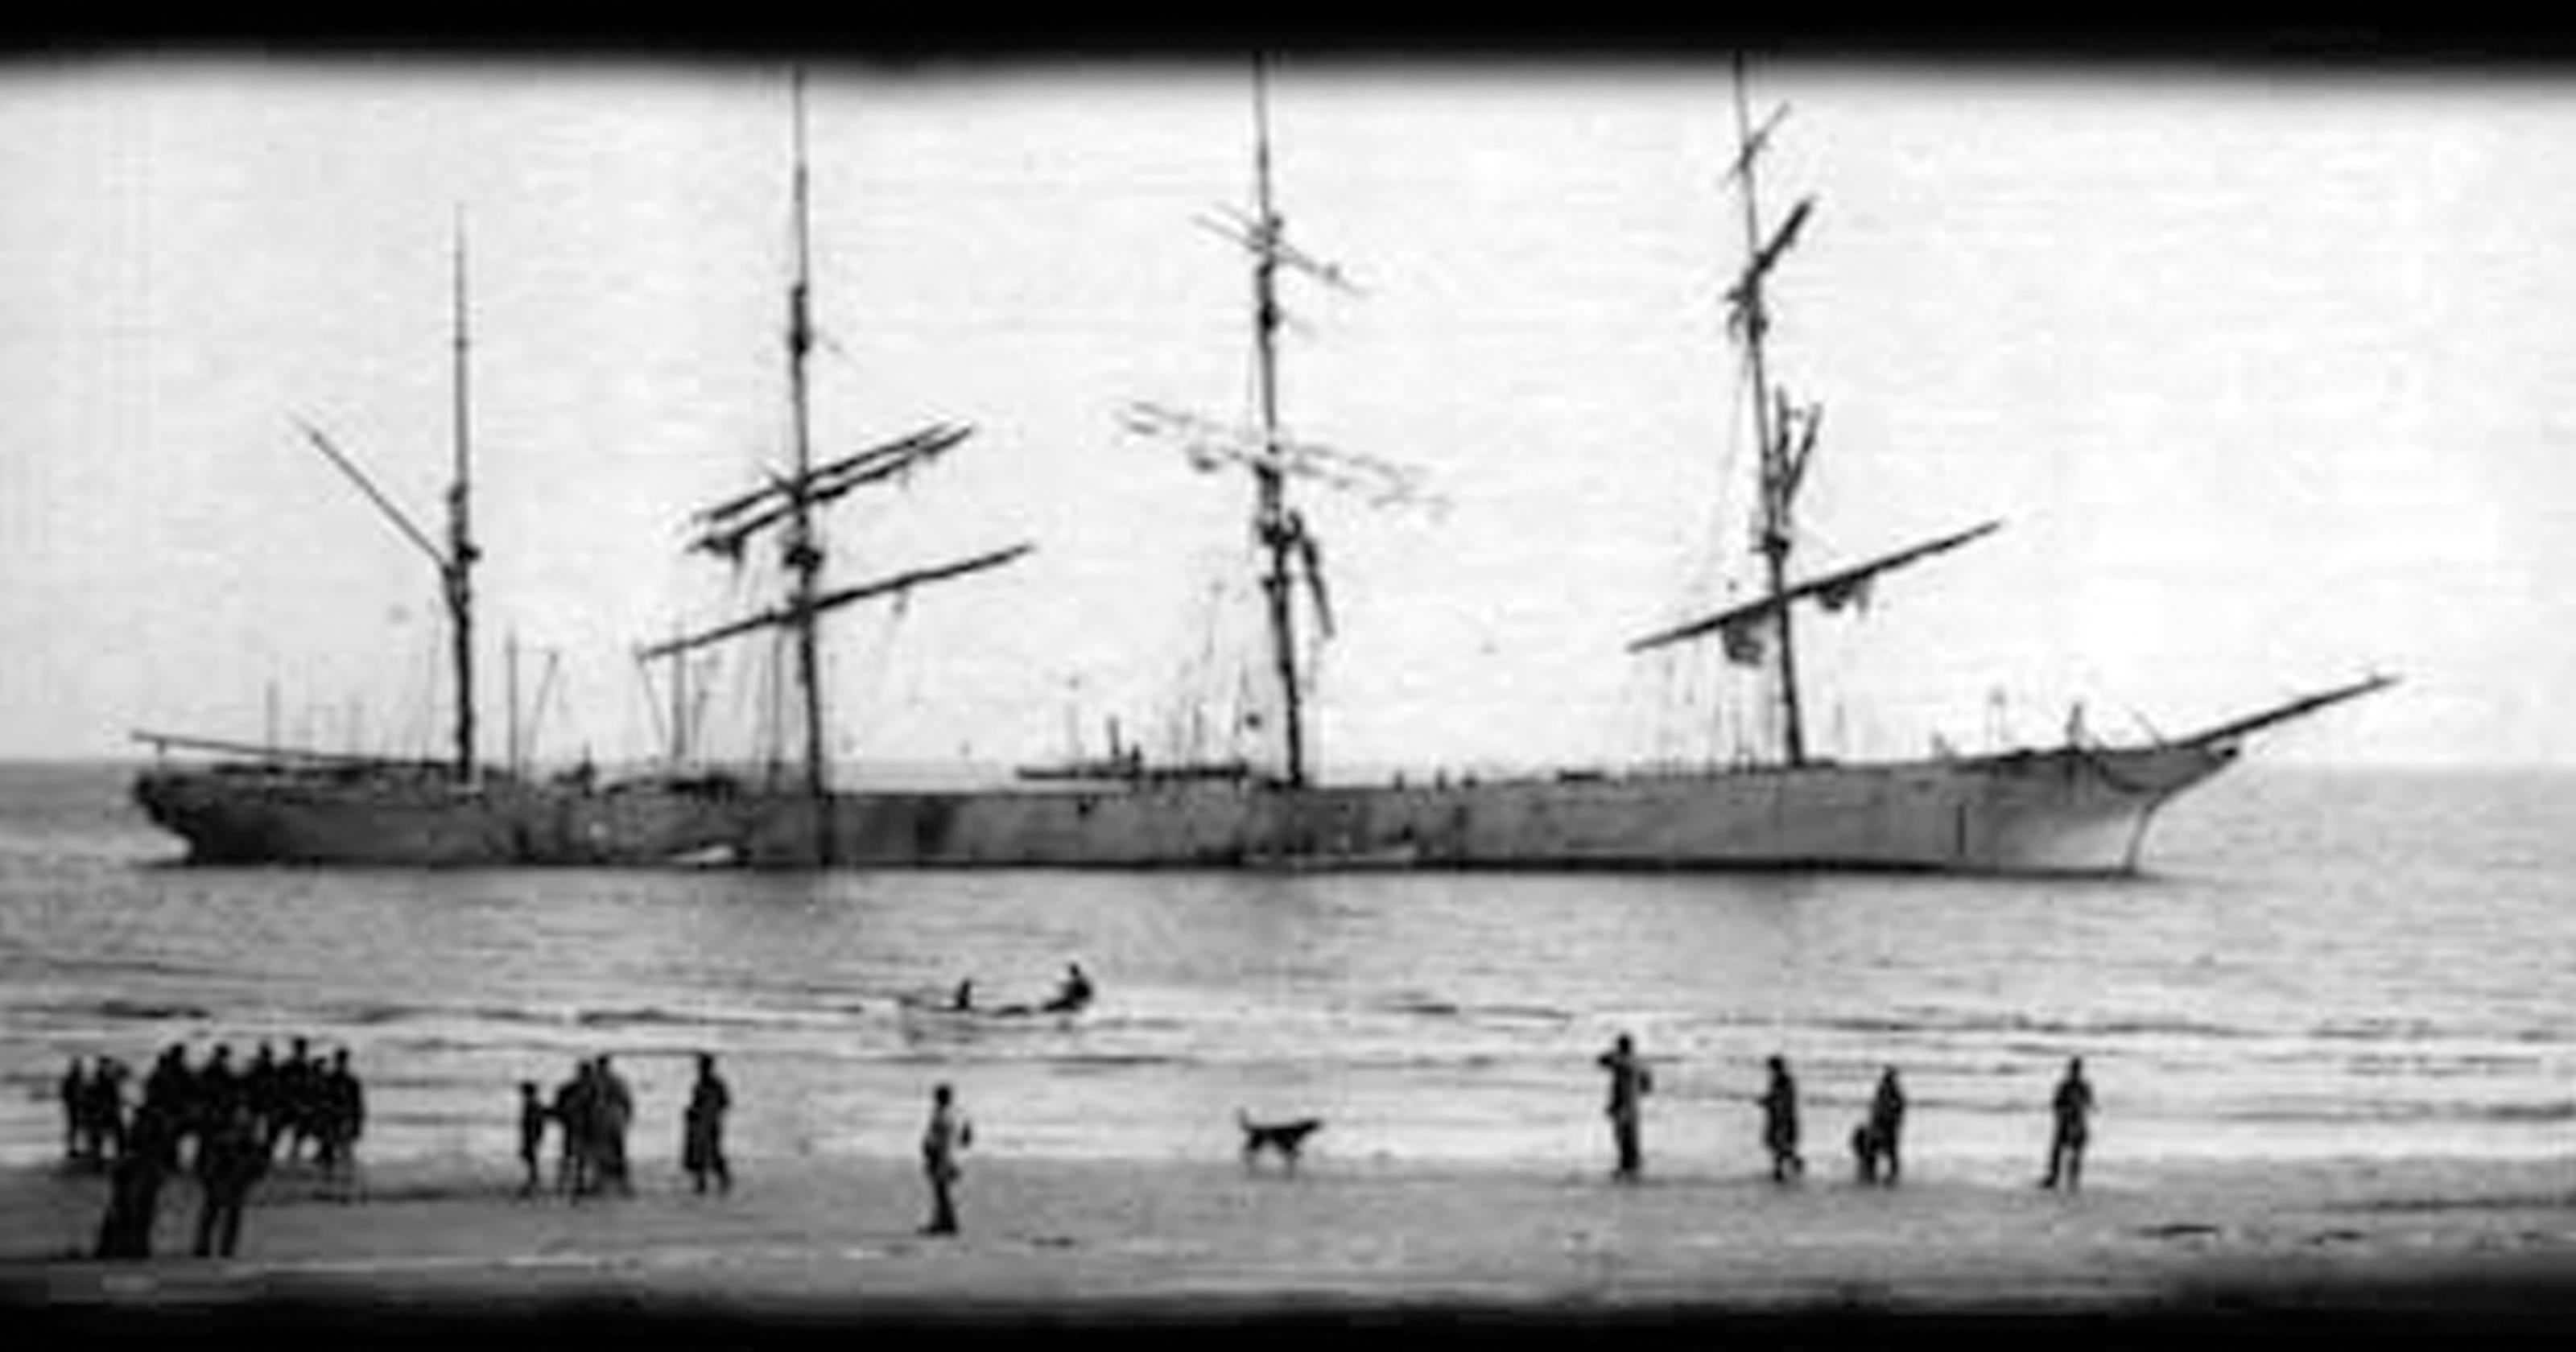 Weird NJ: Sindia's buried treasure in Ocean City